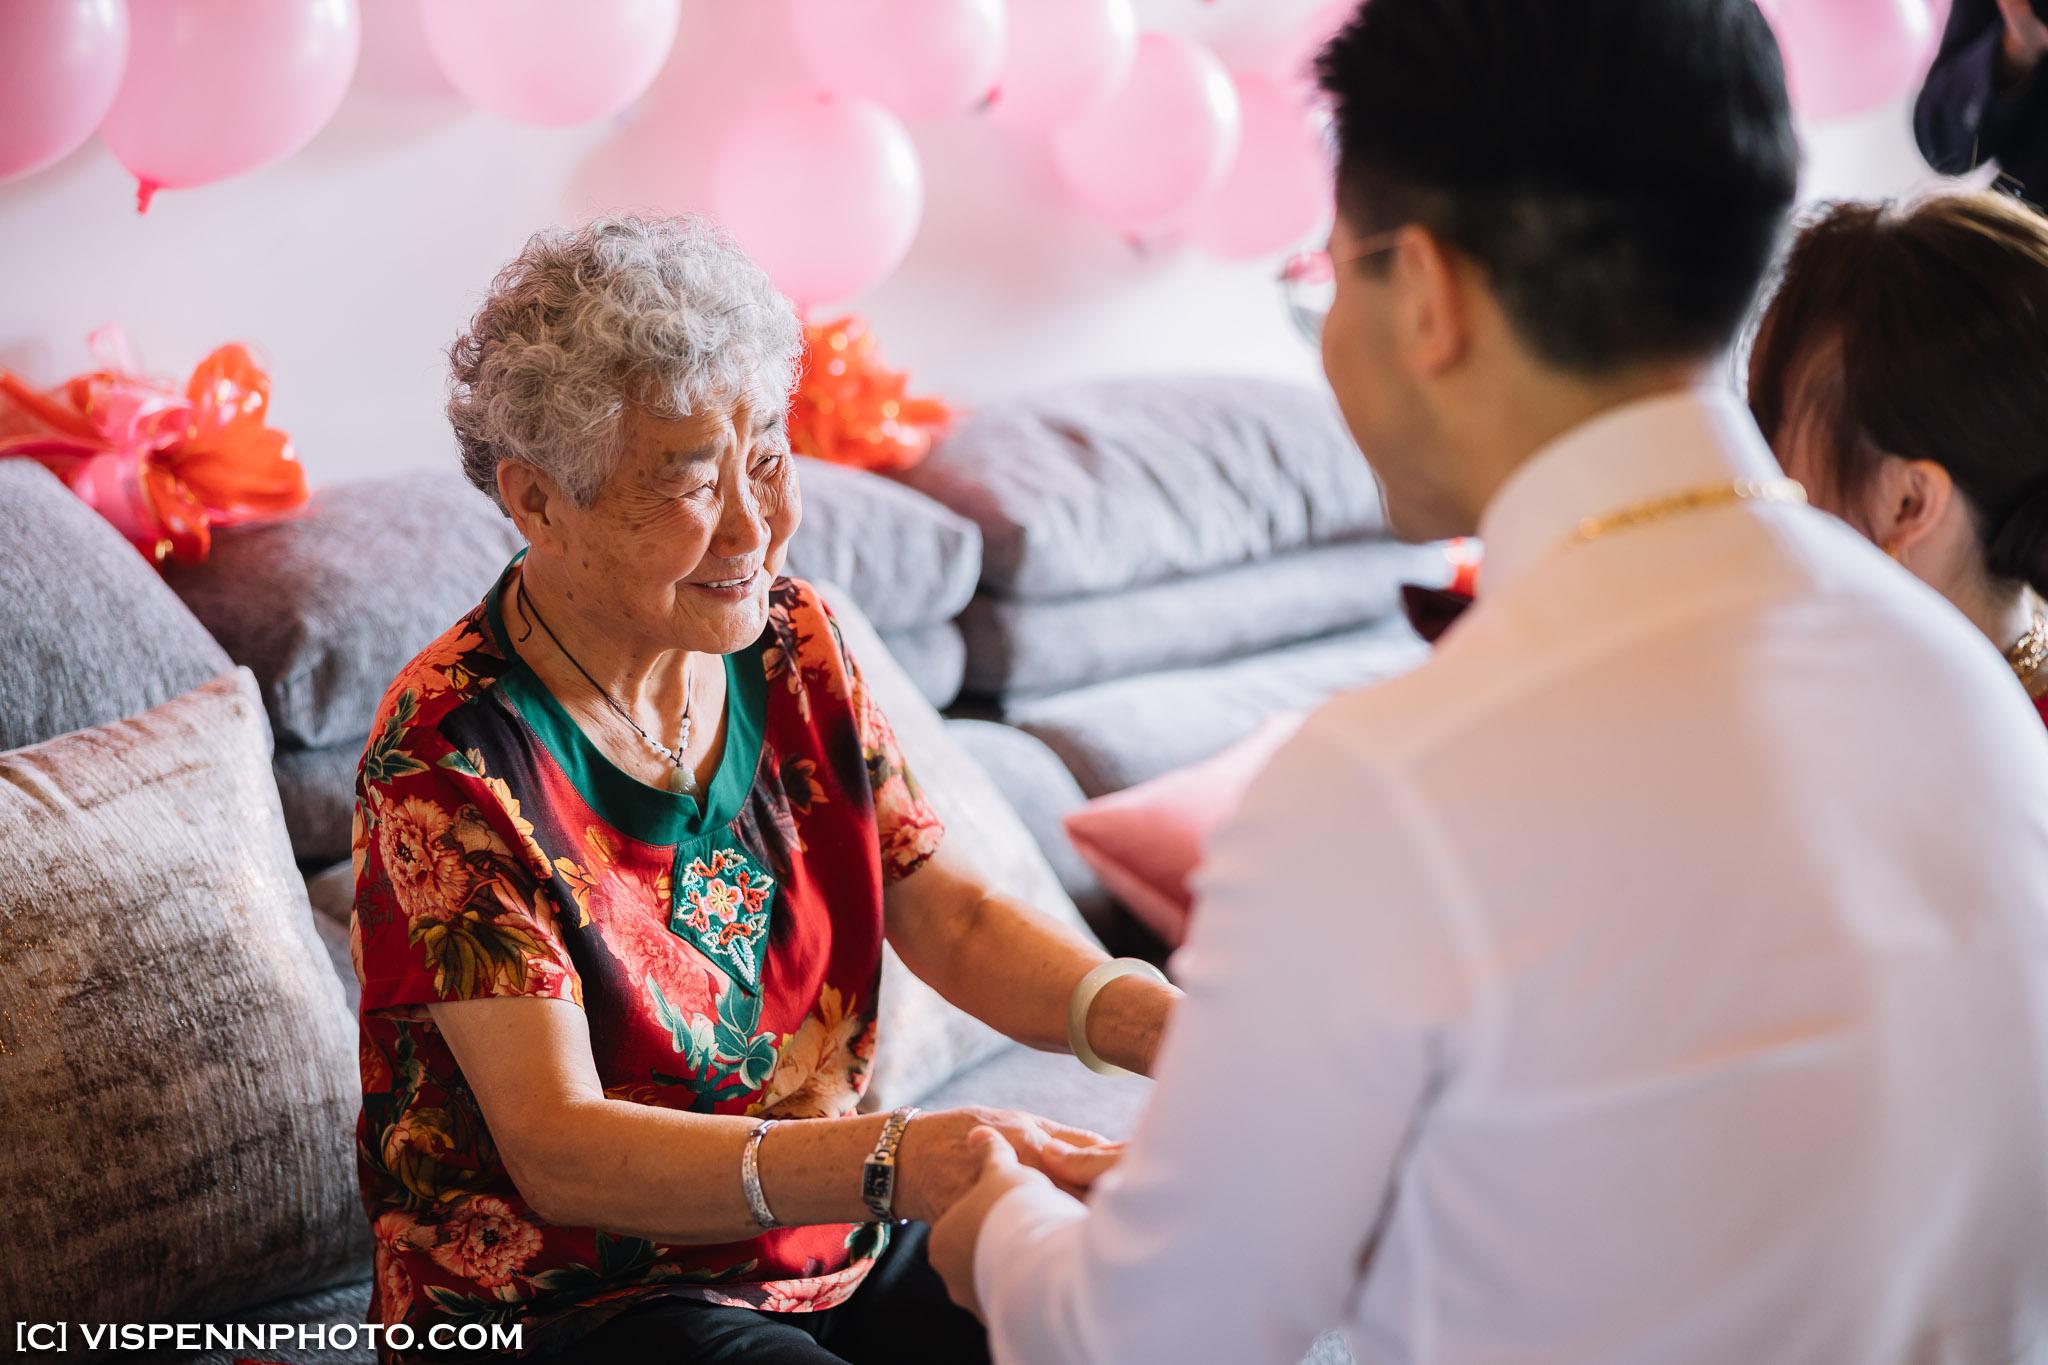 WEDDING DAY Photography Melbourne VISPENN 墨尔本 婚礼跟拍 婚礼摄像 婚礼摄影 结婚照 登记照 ElitaPB 03195 1P EOSR VISPENN